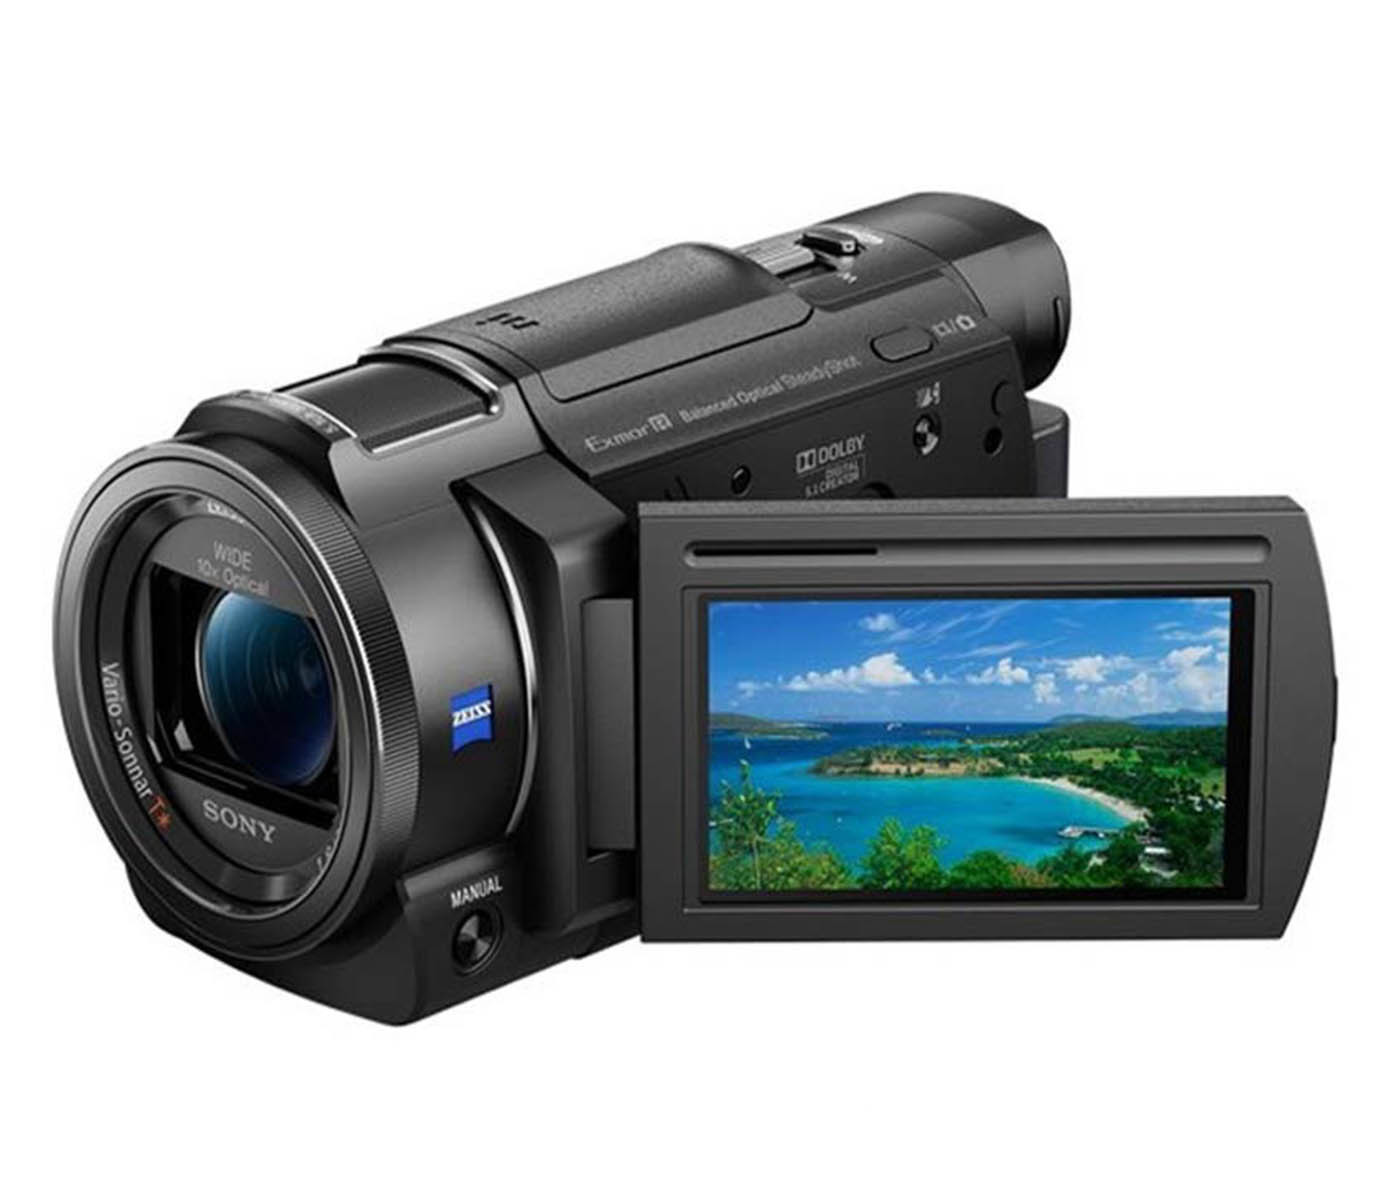 FDR-AX33B видеокамера Sony Handycam в Sony Centre Воронеж